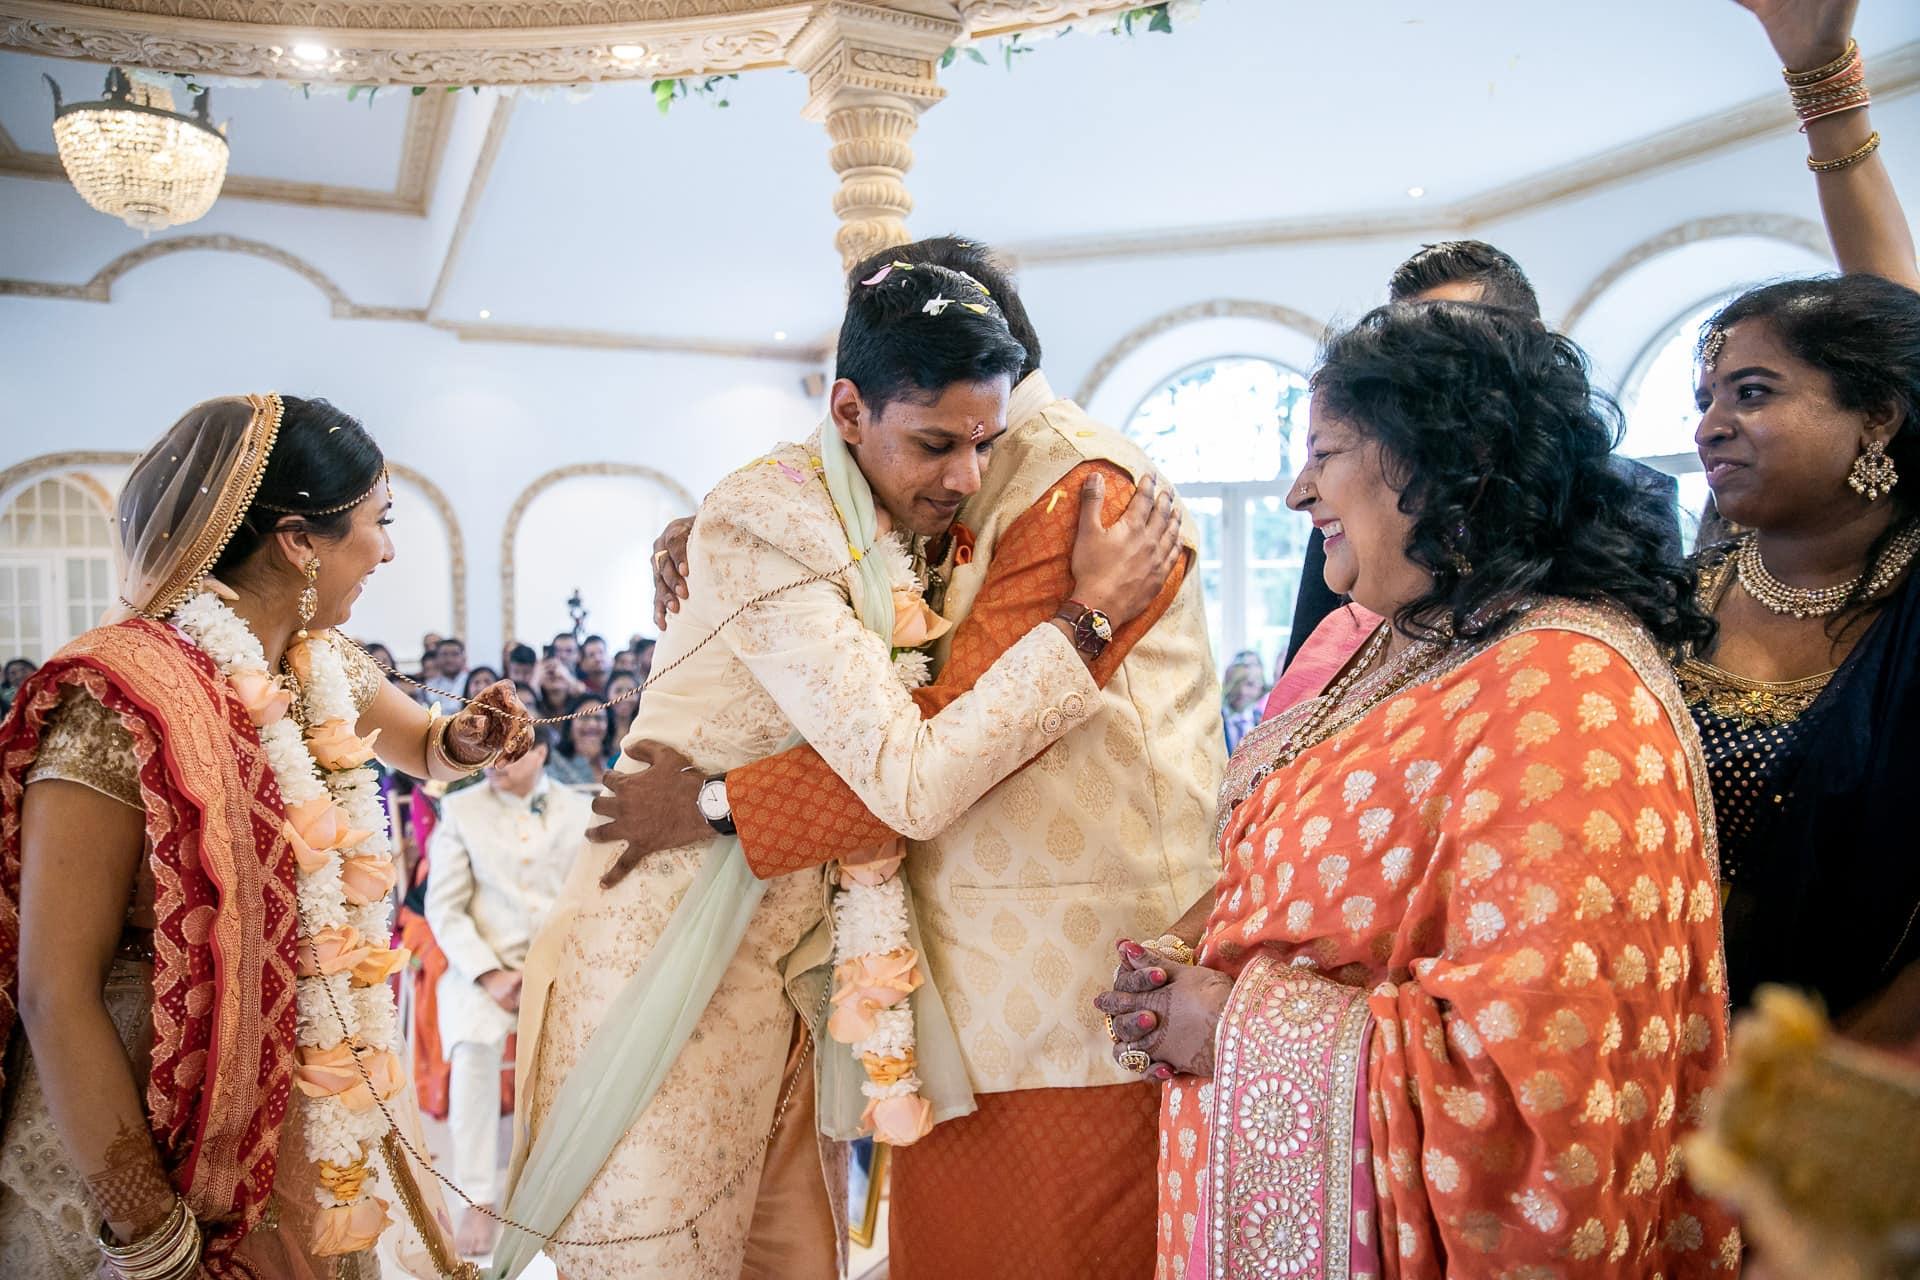 Phera ceremony during Asian wedding